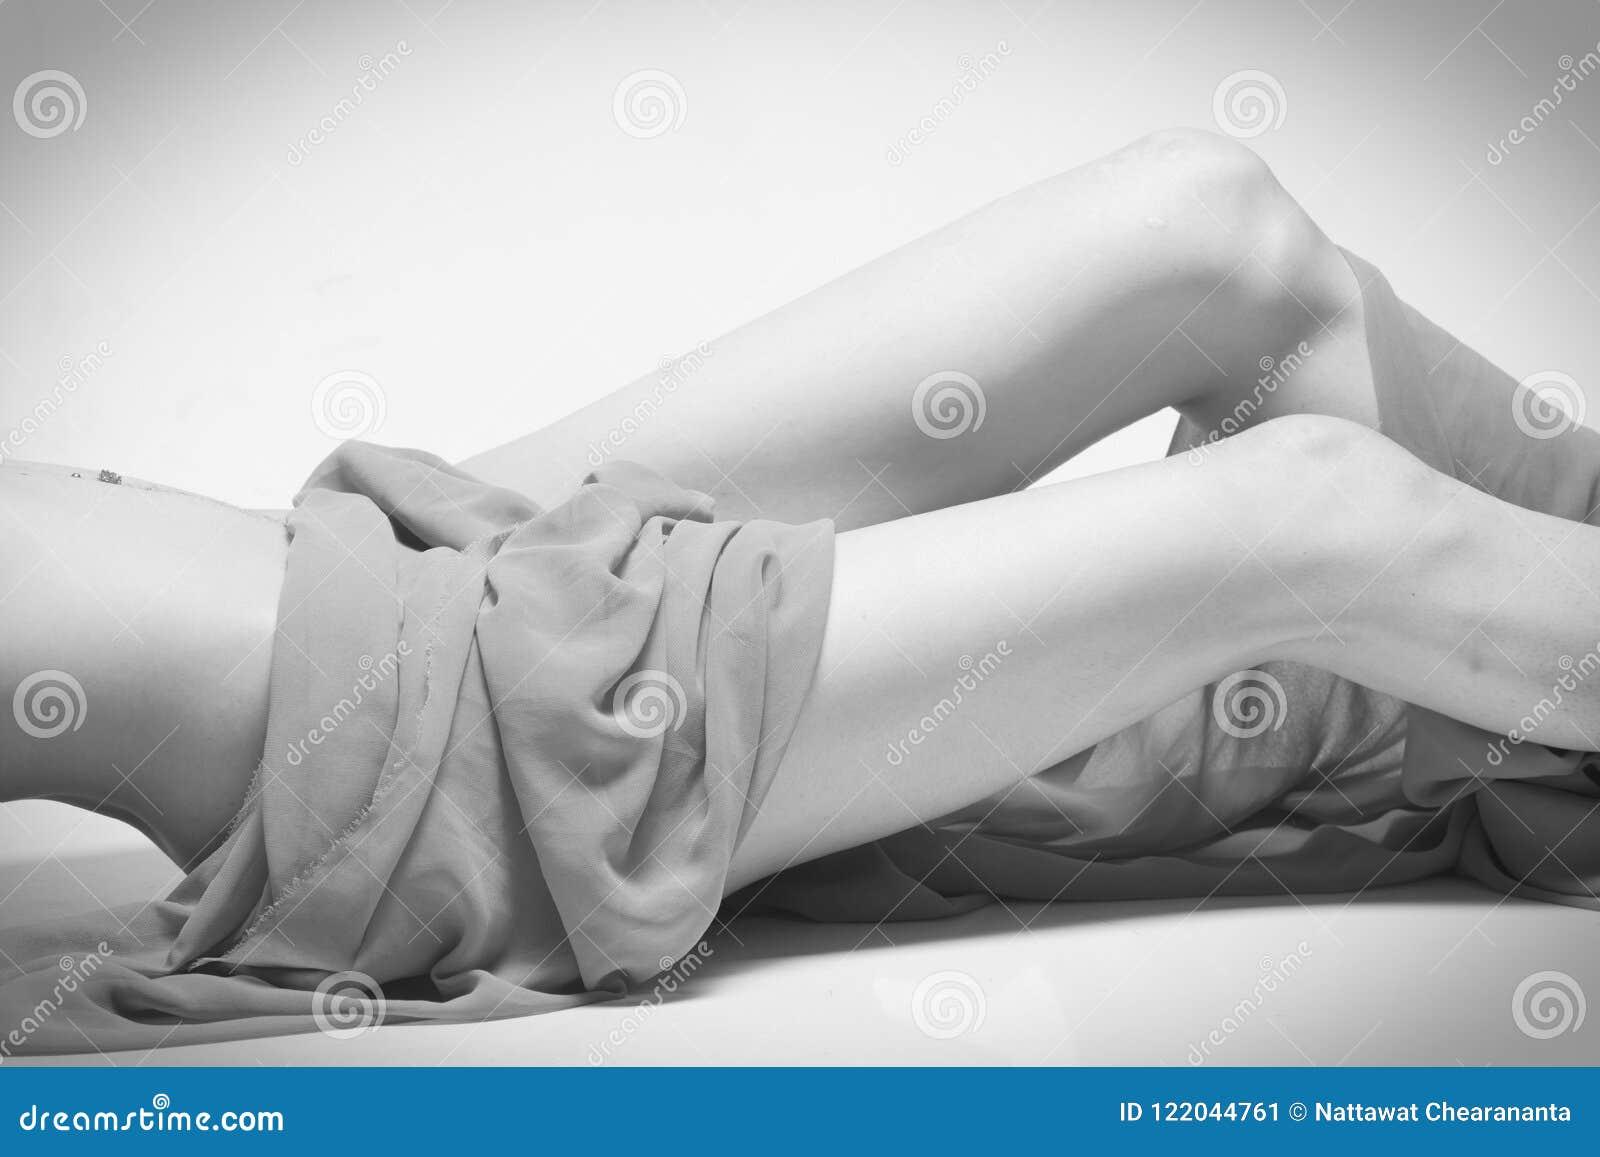 Sexyest Bikini Naked Black White Asian